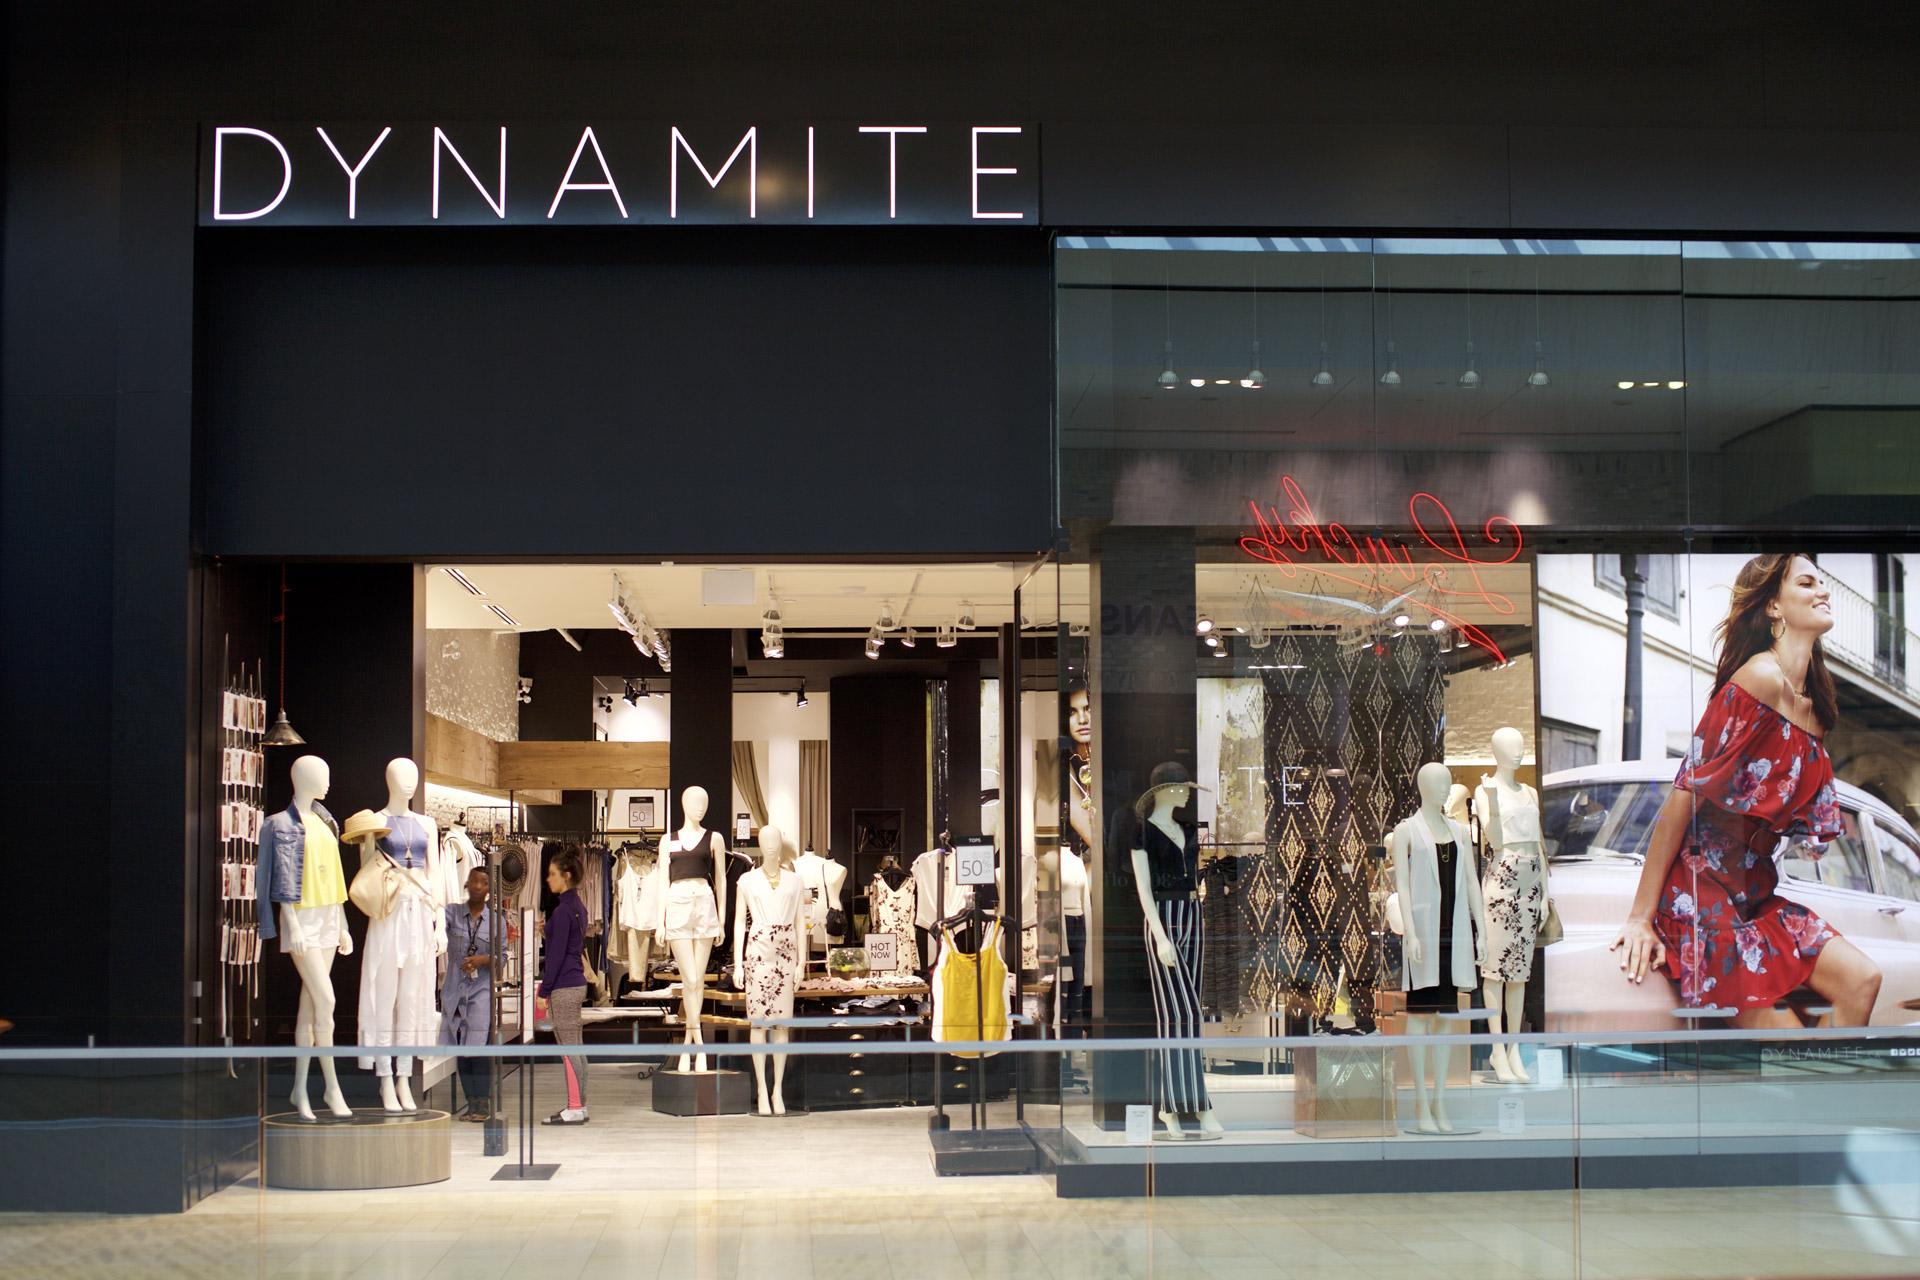 dynamite storefront